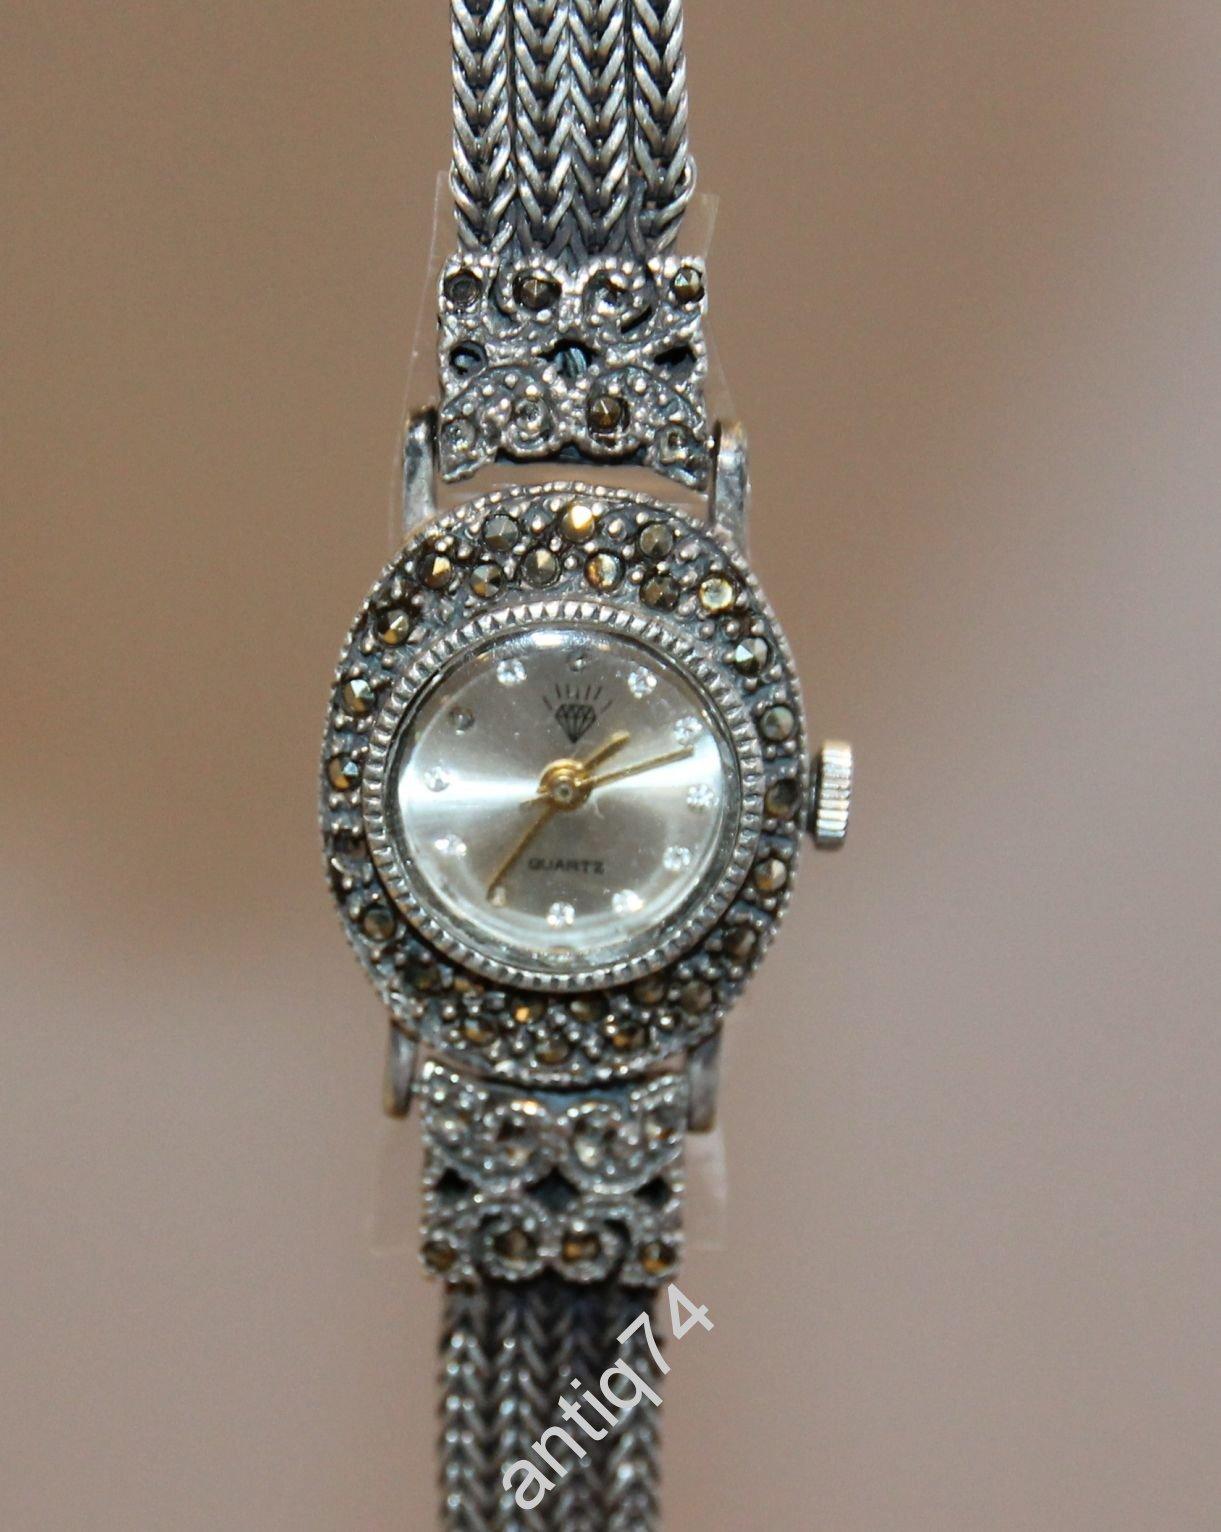 a56524e6 женские часы. Серебро 925 проба   Часы — Антикварный салон «Арбатъ»